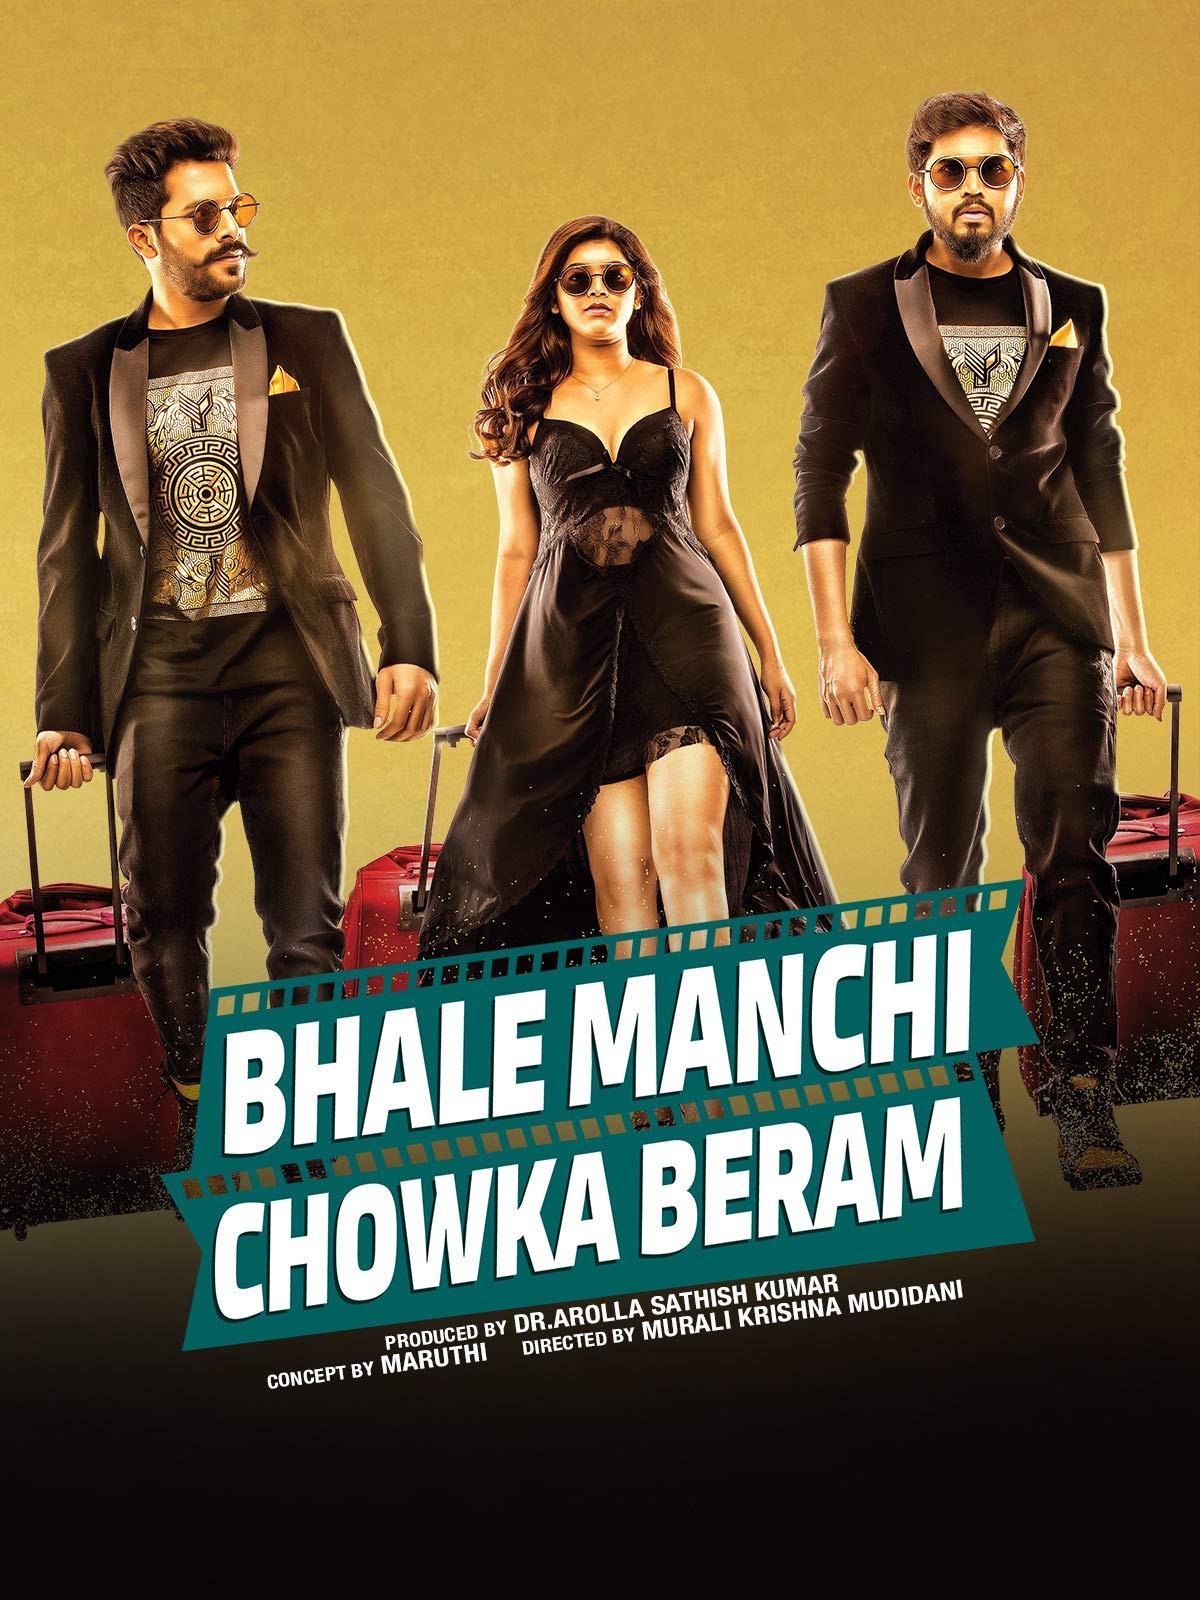 Bhale Manchi Chowka Beramu